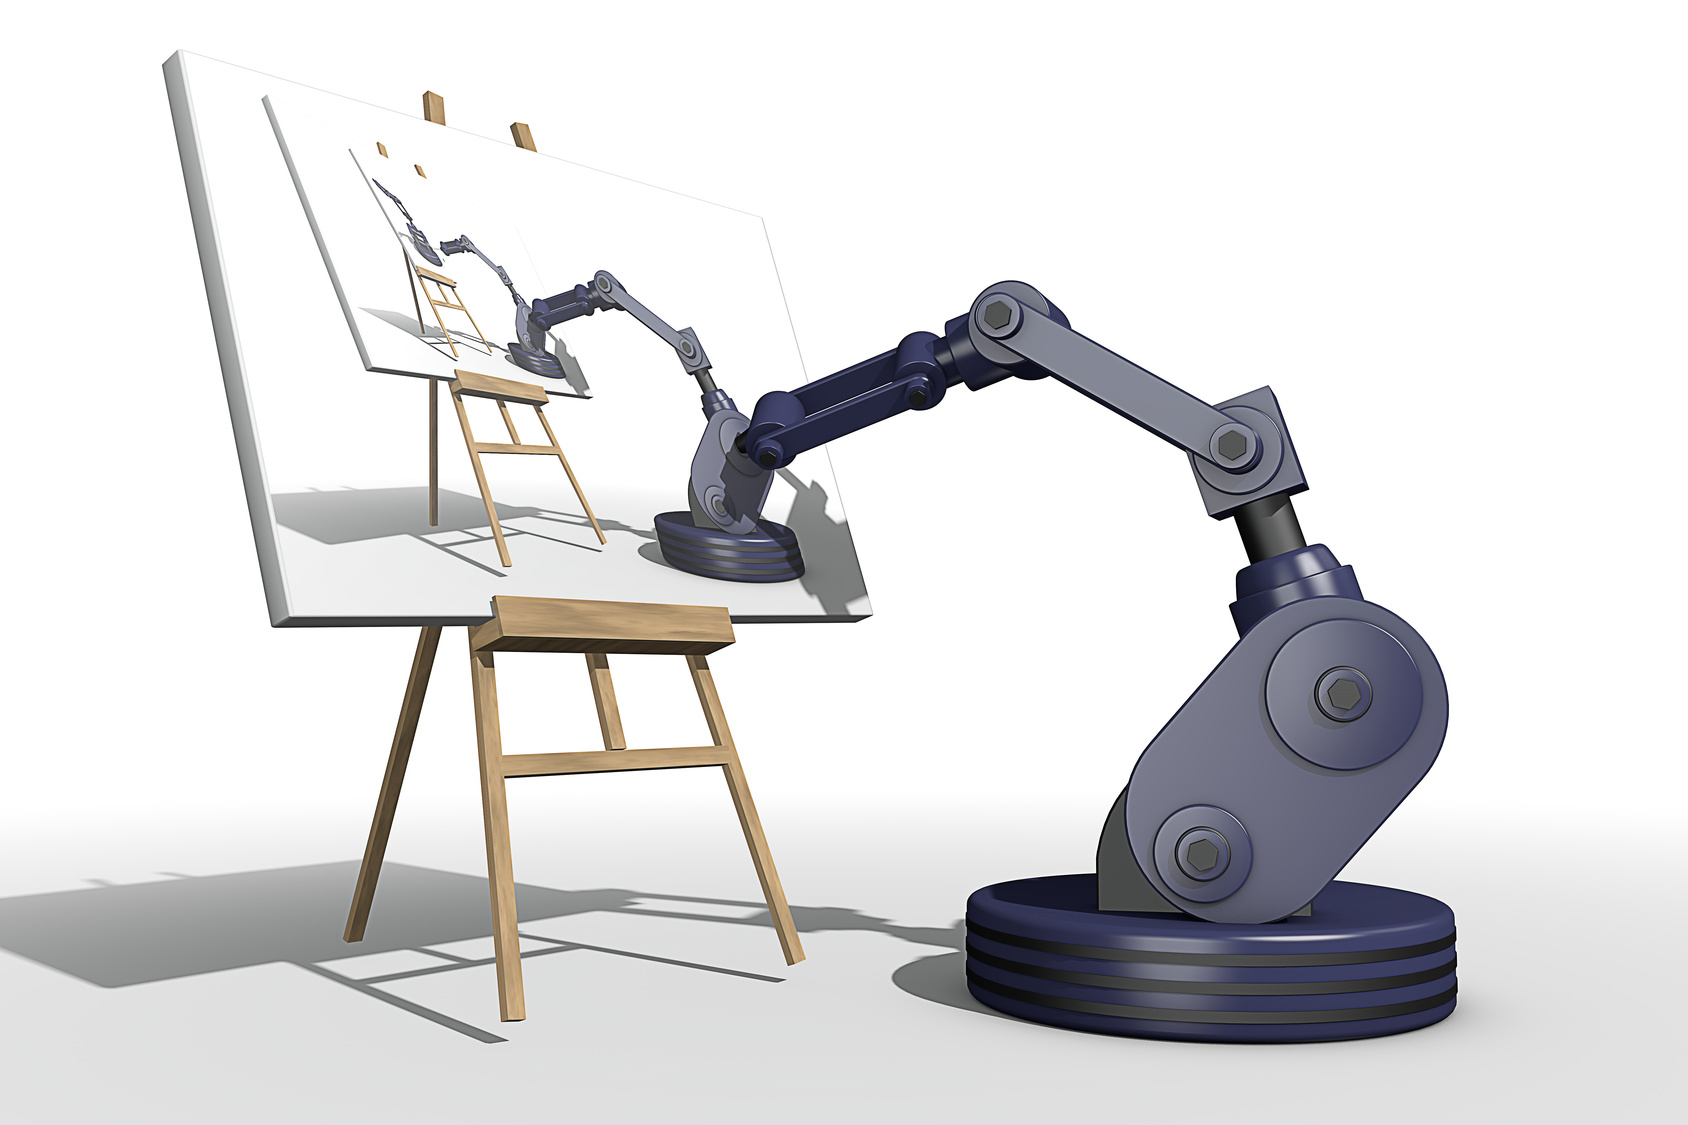 Robot drawing a robot drawing a robot